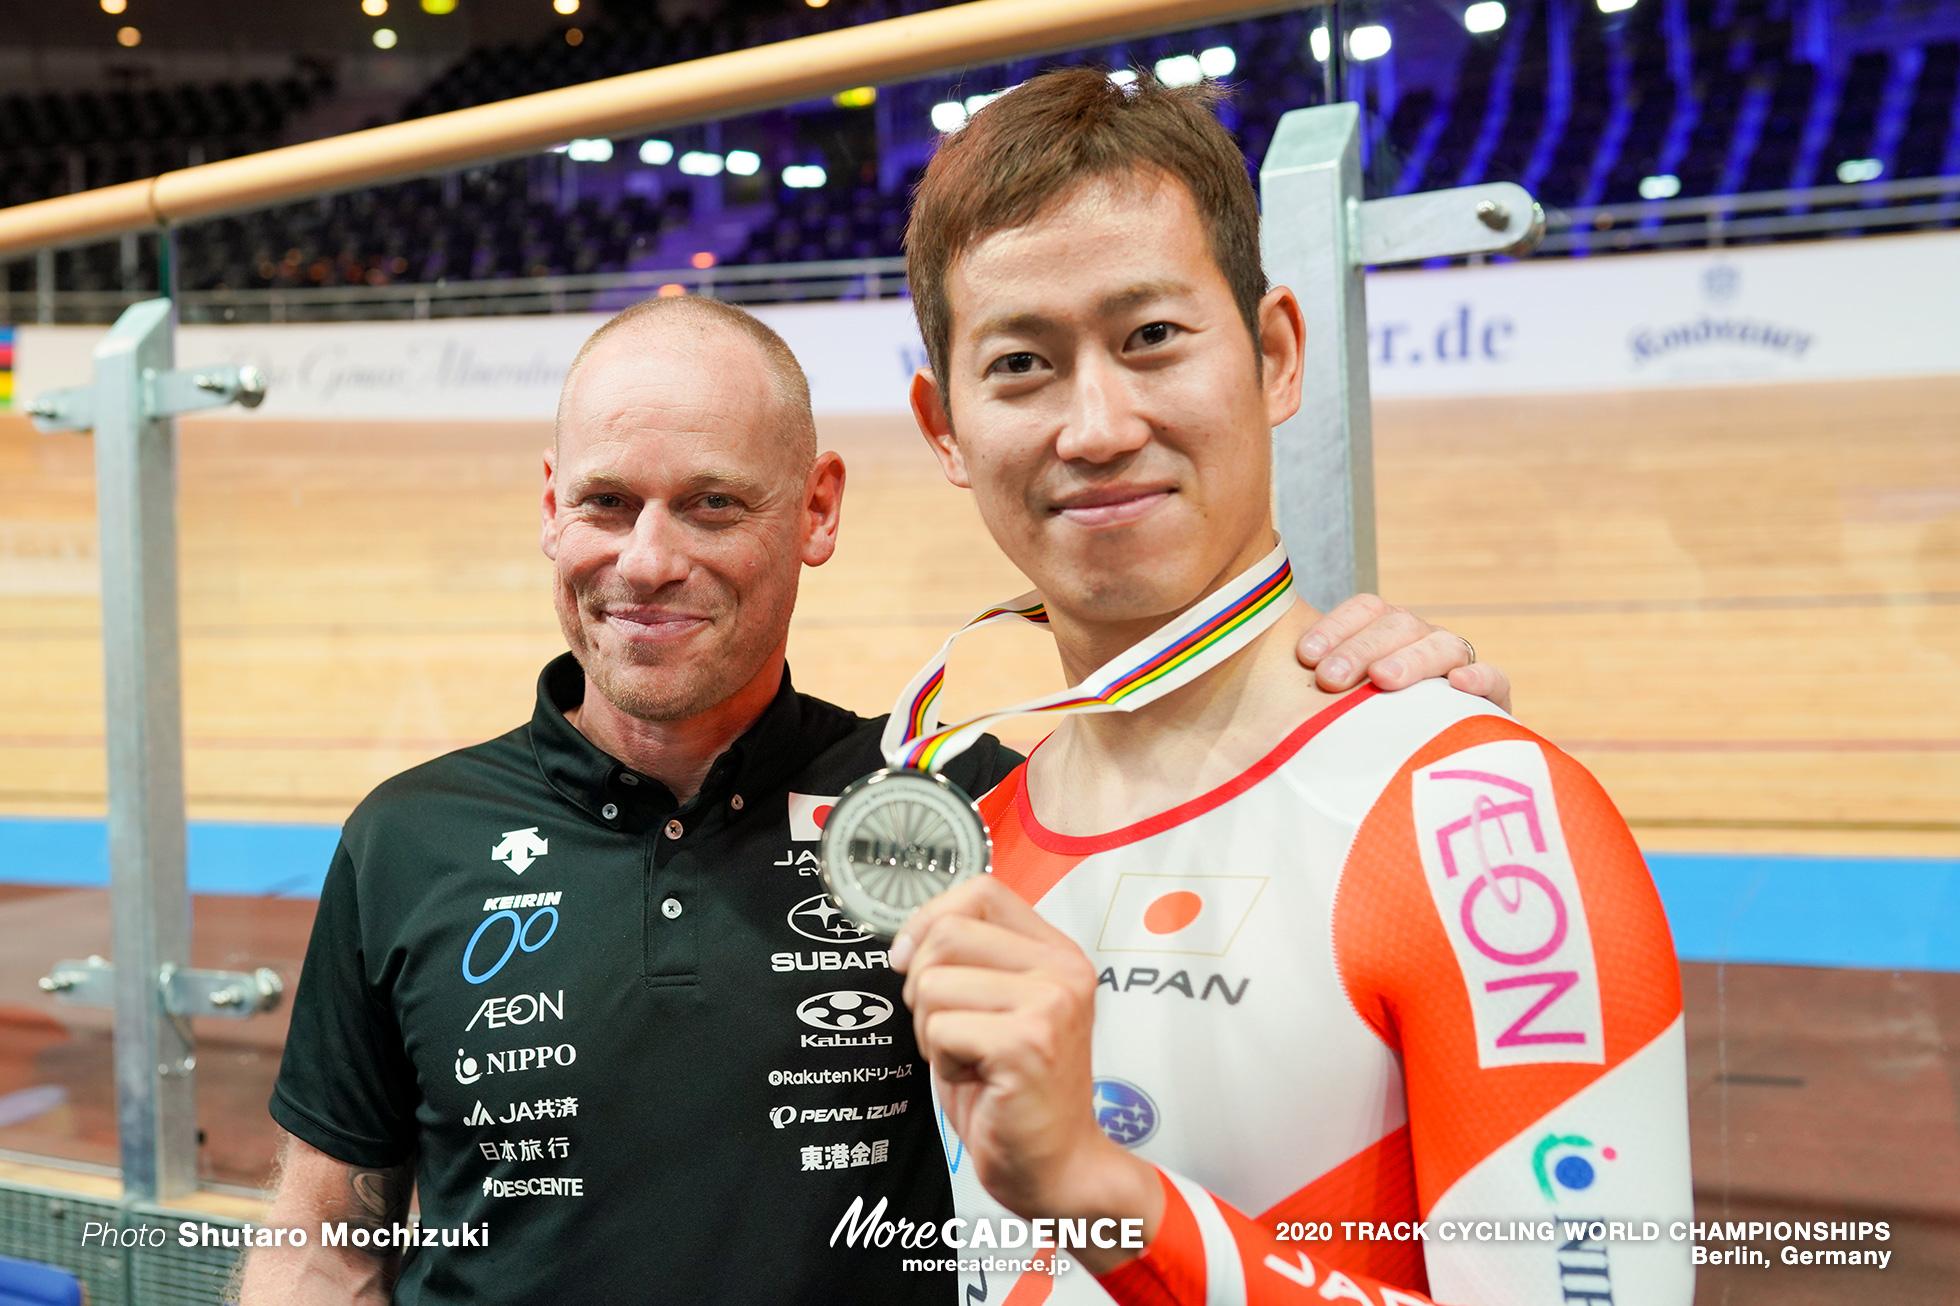 Final / Men's Keirin / 2020 Track Cycling World Championships, 脇本雄太 Wakimoto Yuta, ブノワ・ベトゥBenoit Vetu